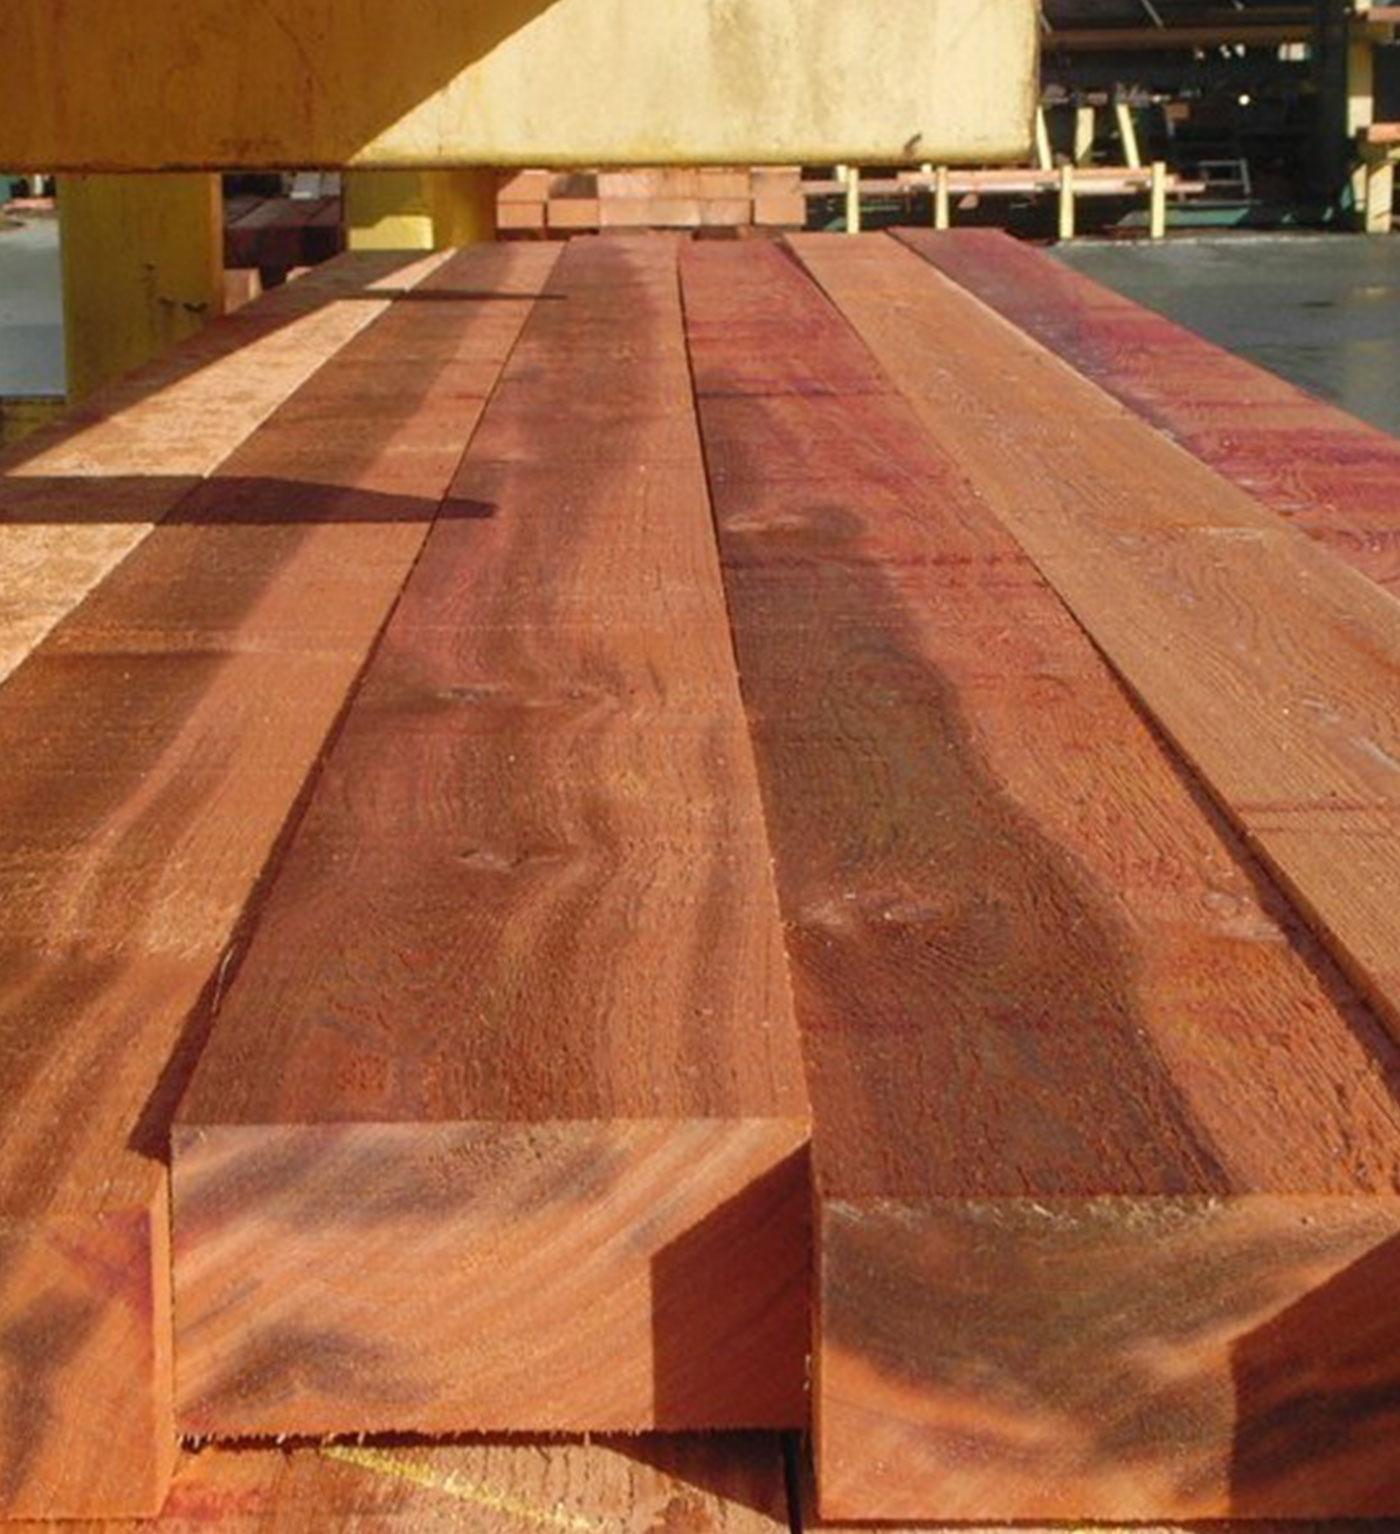 western-red-cedar-lumber-supply-store-eureka-ca-humboldt-county-california